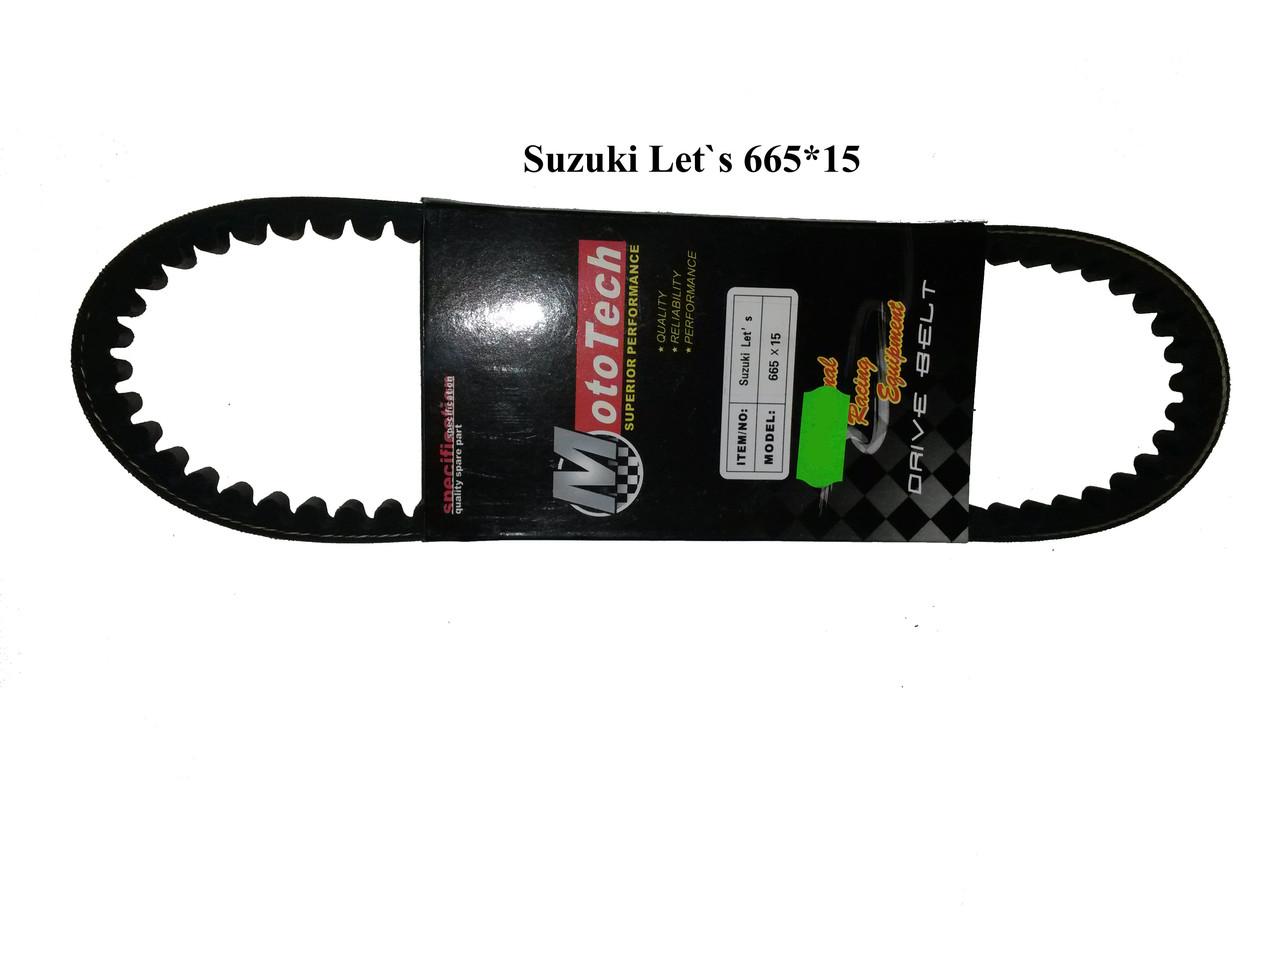 Ремень вариатора 665*15 Suzuki LETS Mototech